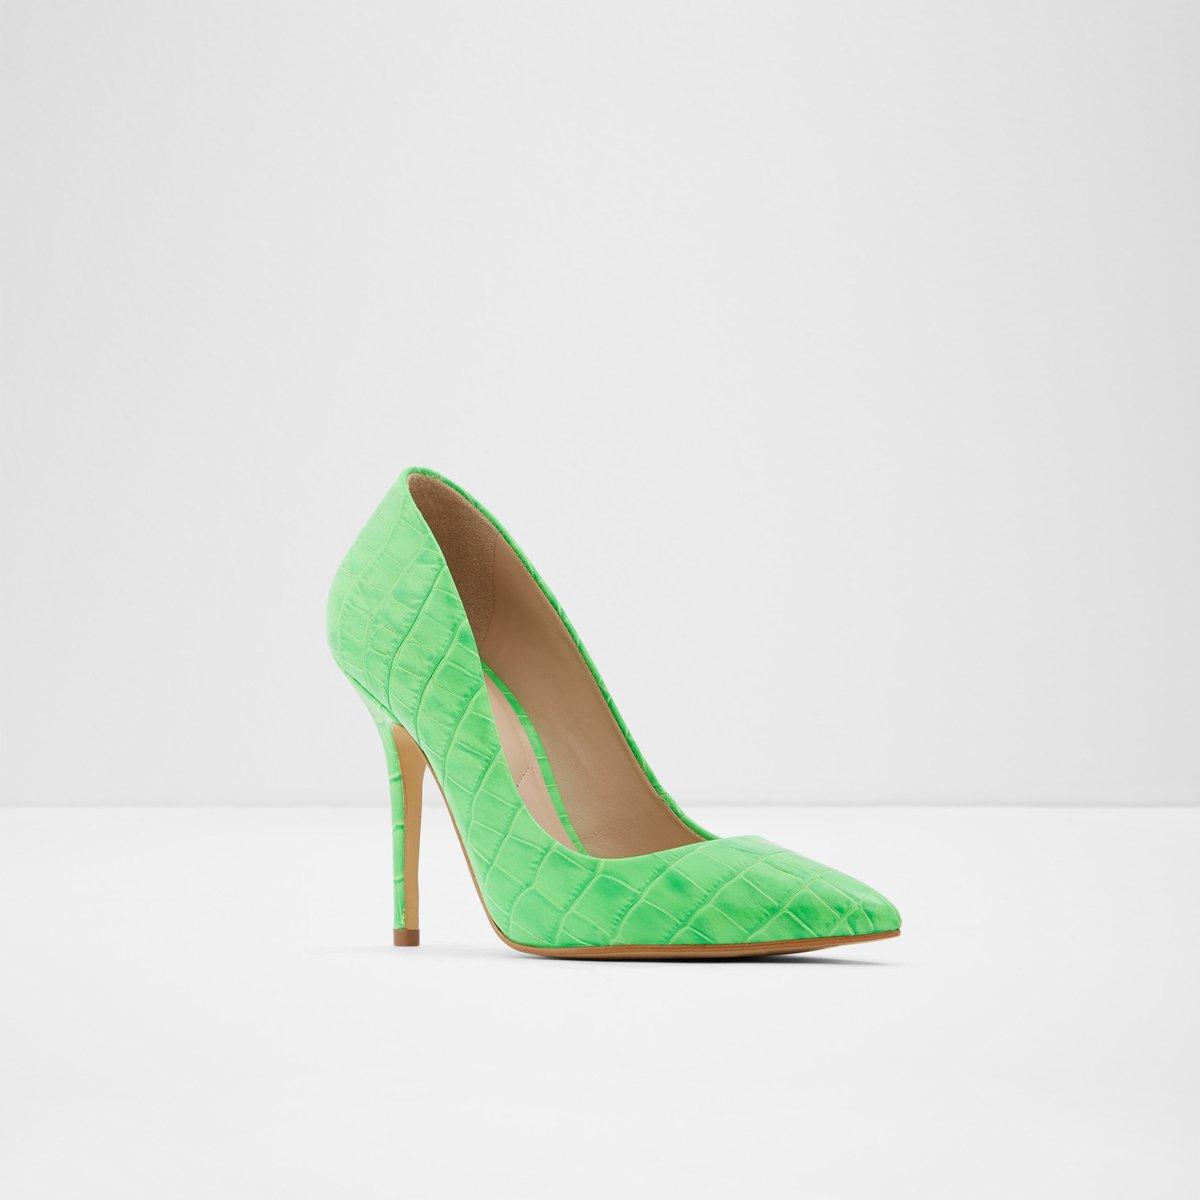 Sevielith Bright Green Women's Heels